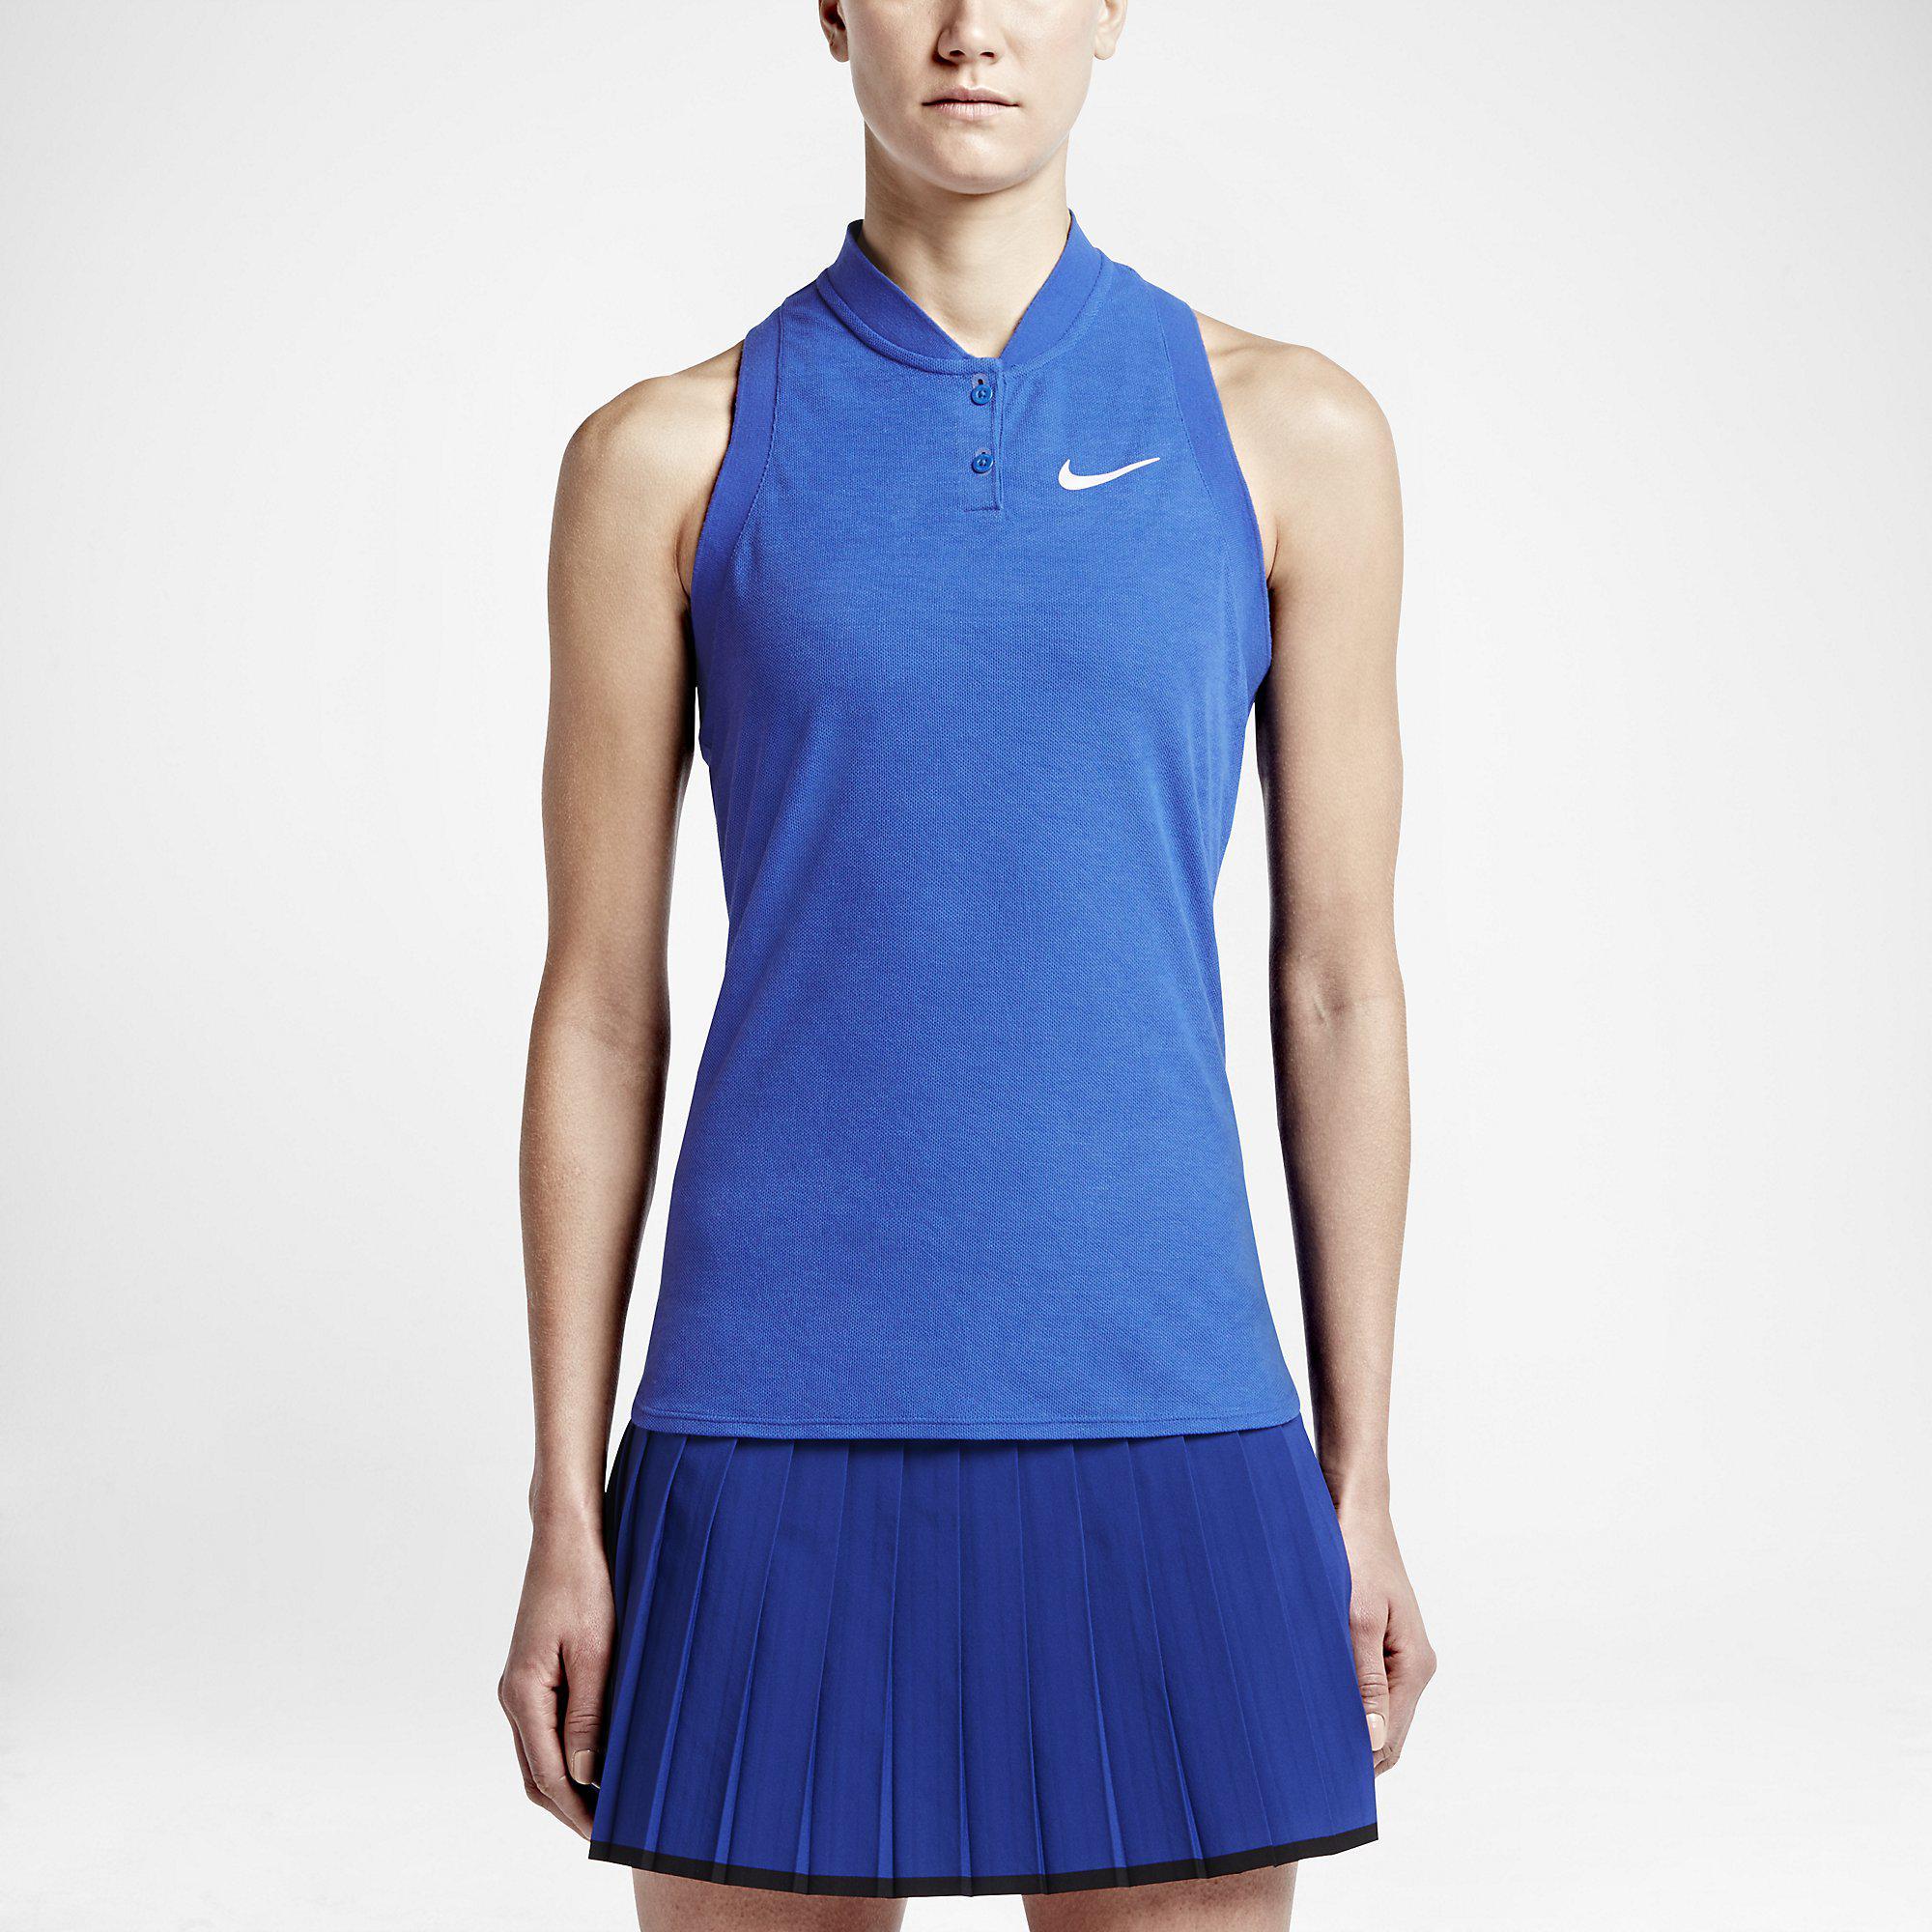 Out Of Stock. Nike Womens Premier Advantage Sleeveless Polo - Hyper Cobalt  ...